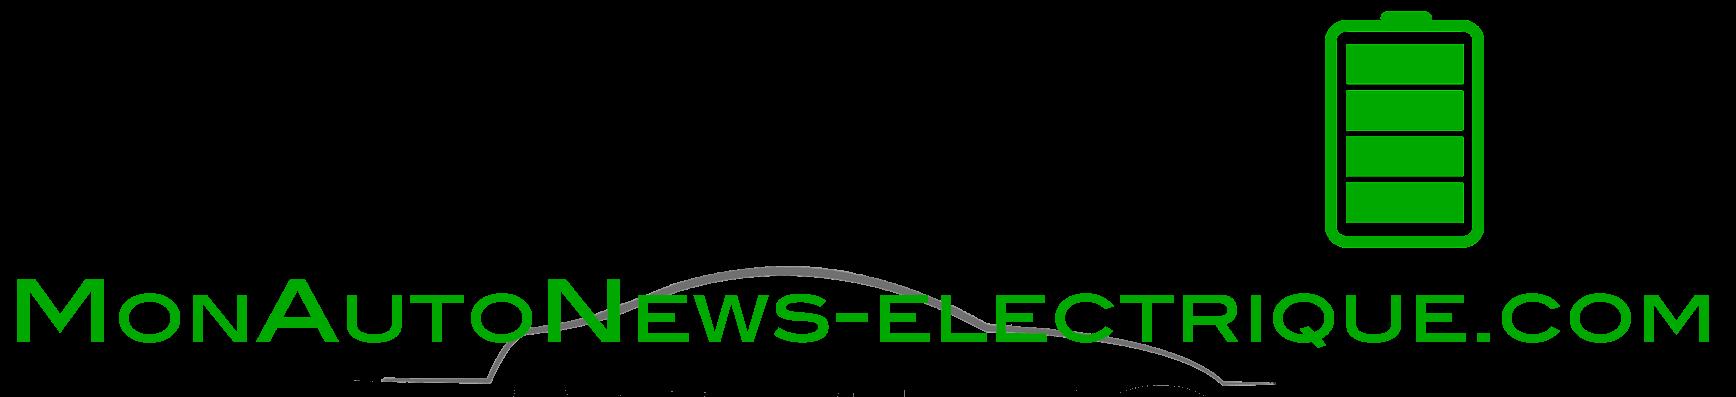 MonAutoNews-Electrique